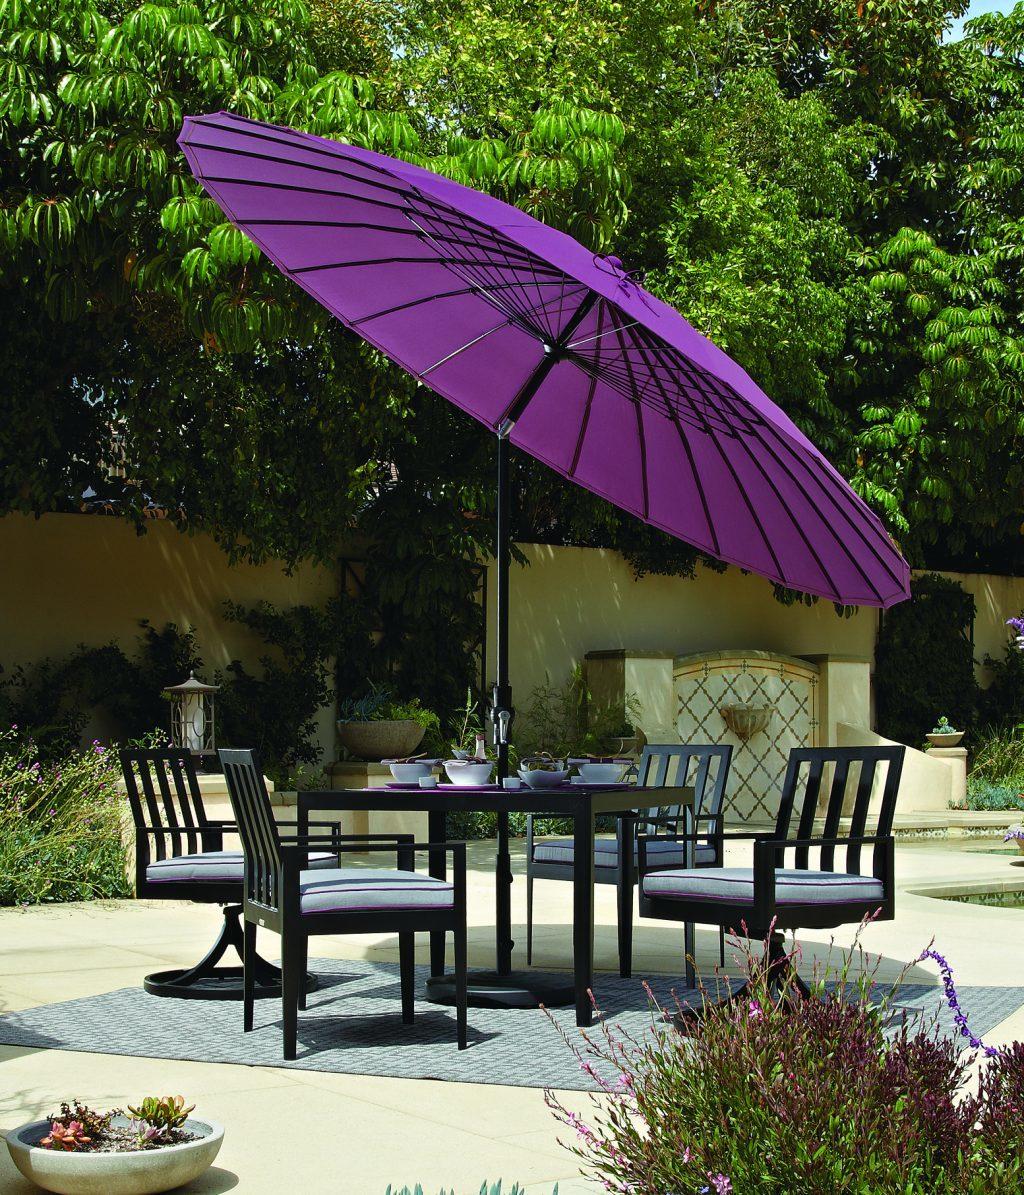 Treasure Garden umbrella with Sunbrella canopy